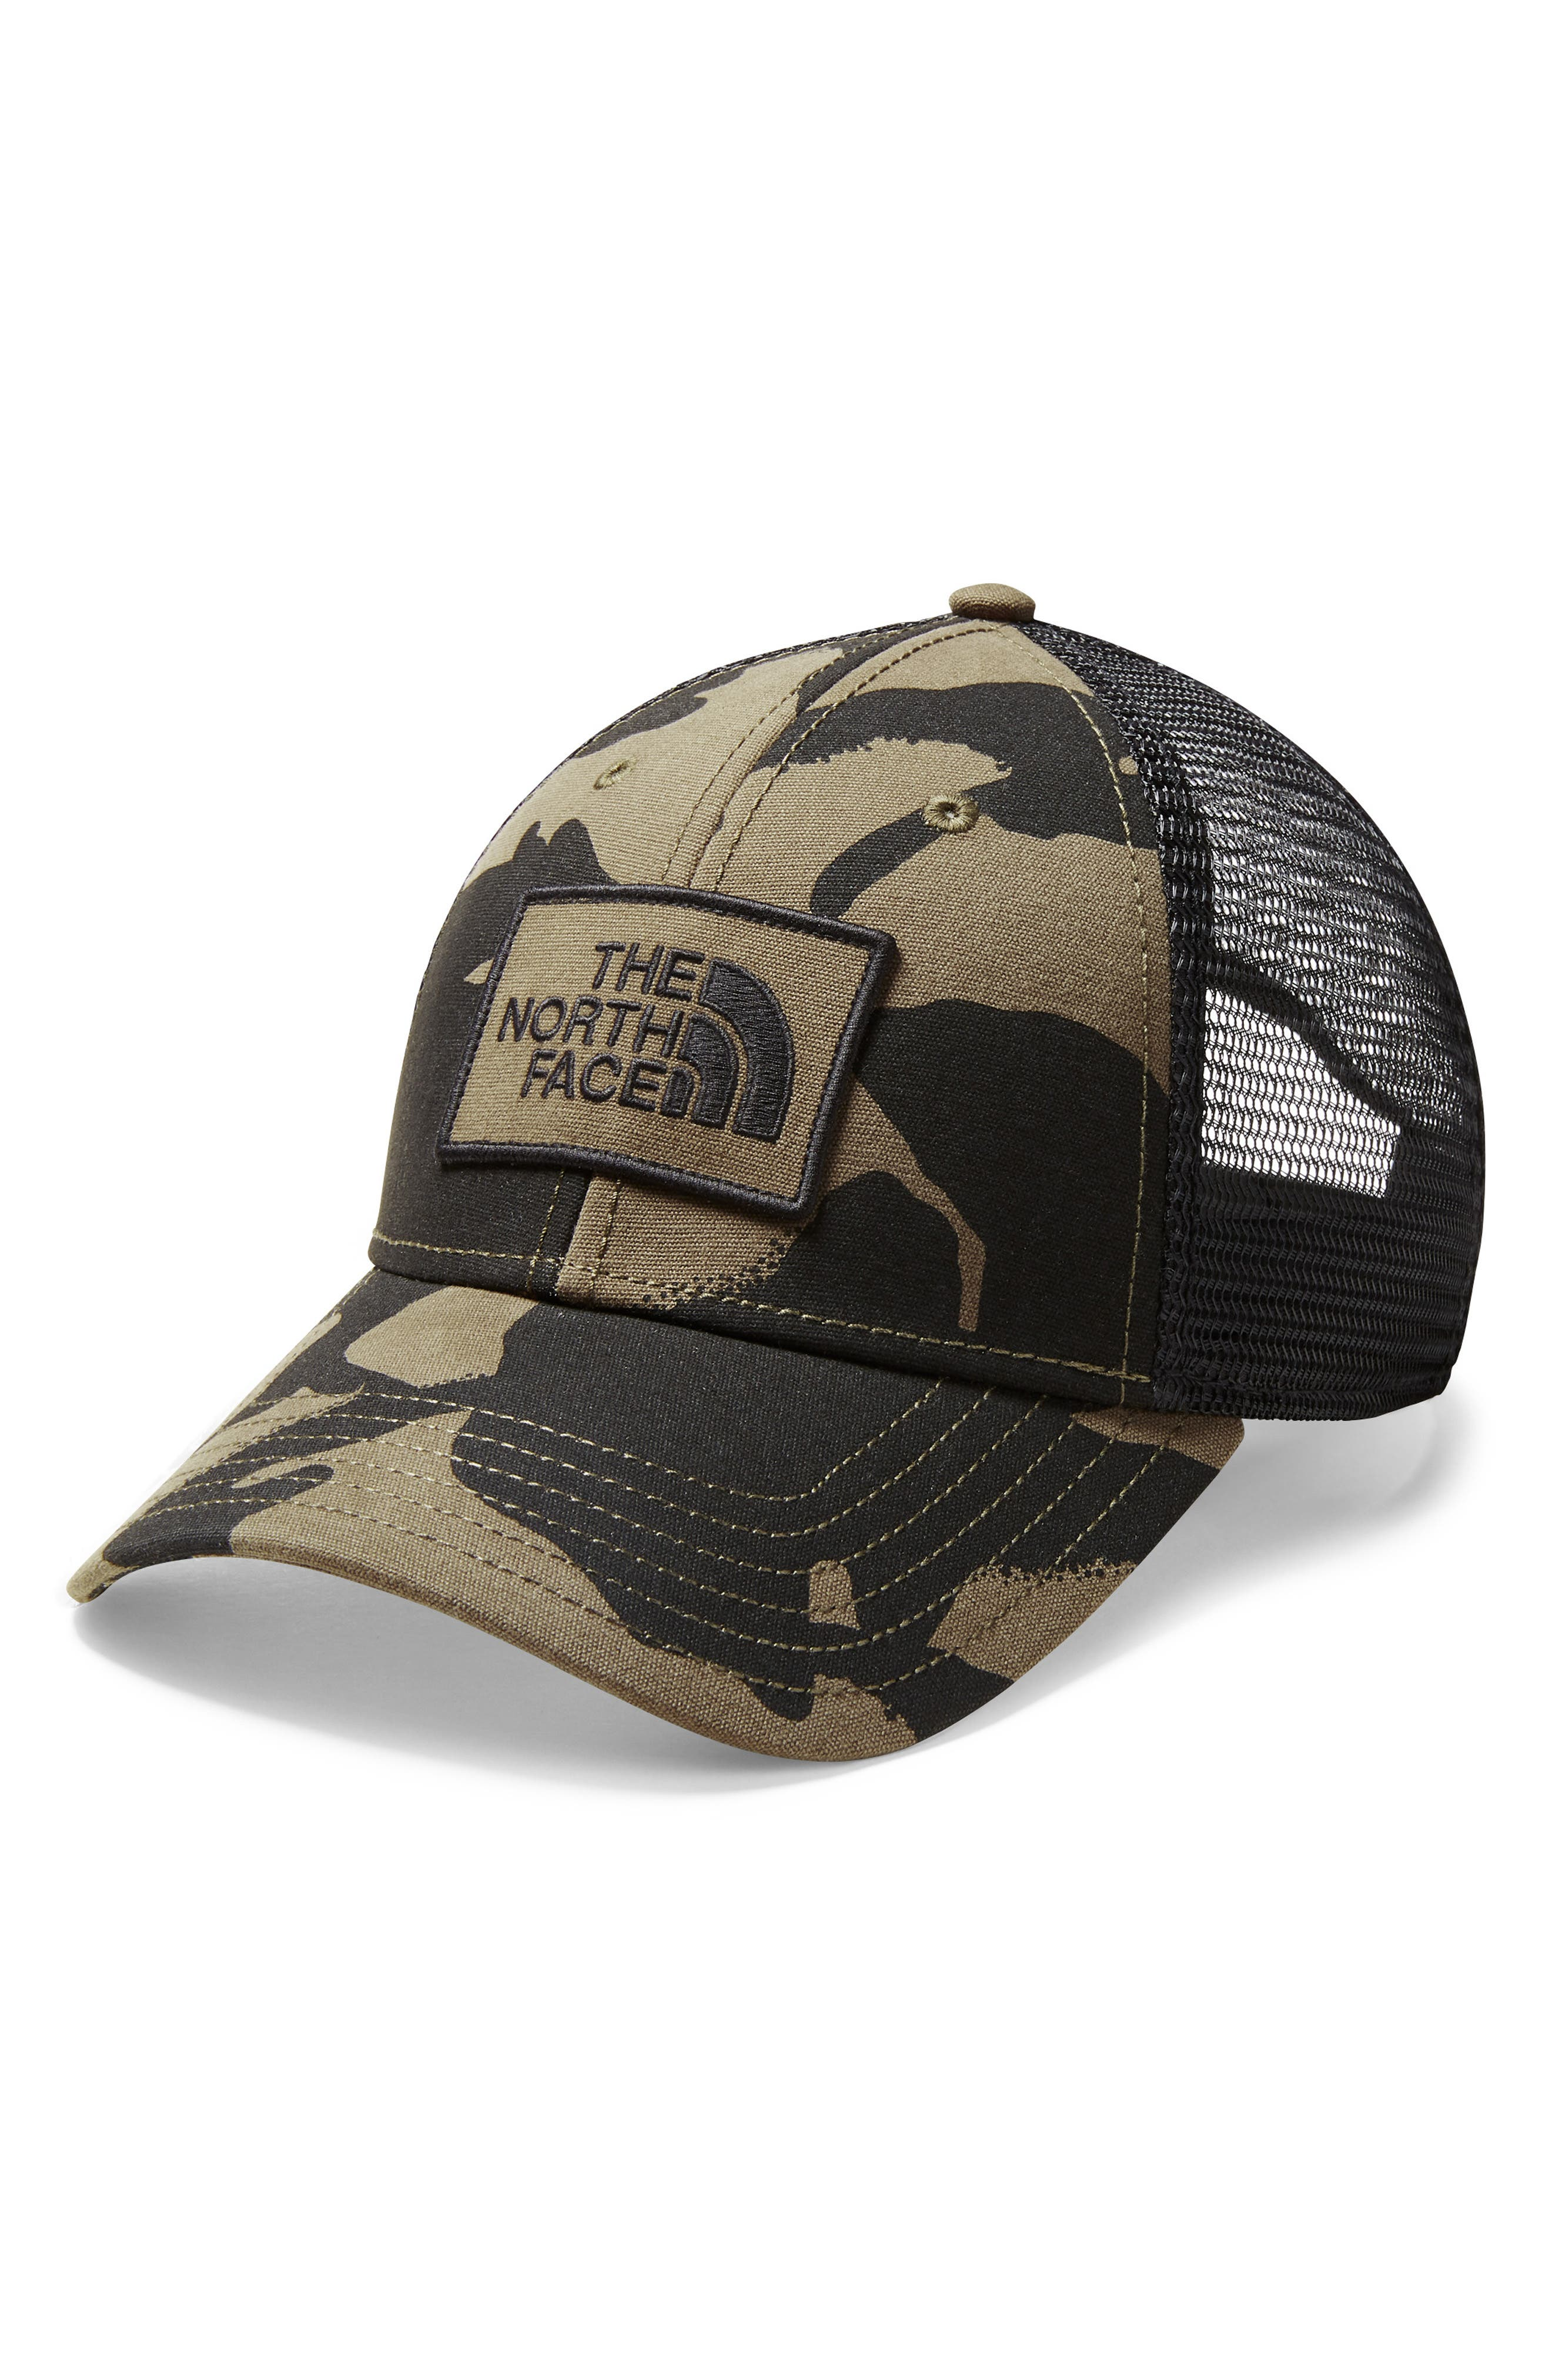 Print Mudder Trucker Hat,                         Main,                         color, BURNT OLIVE GREEN DISRUPT CAMO